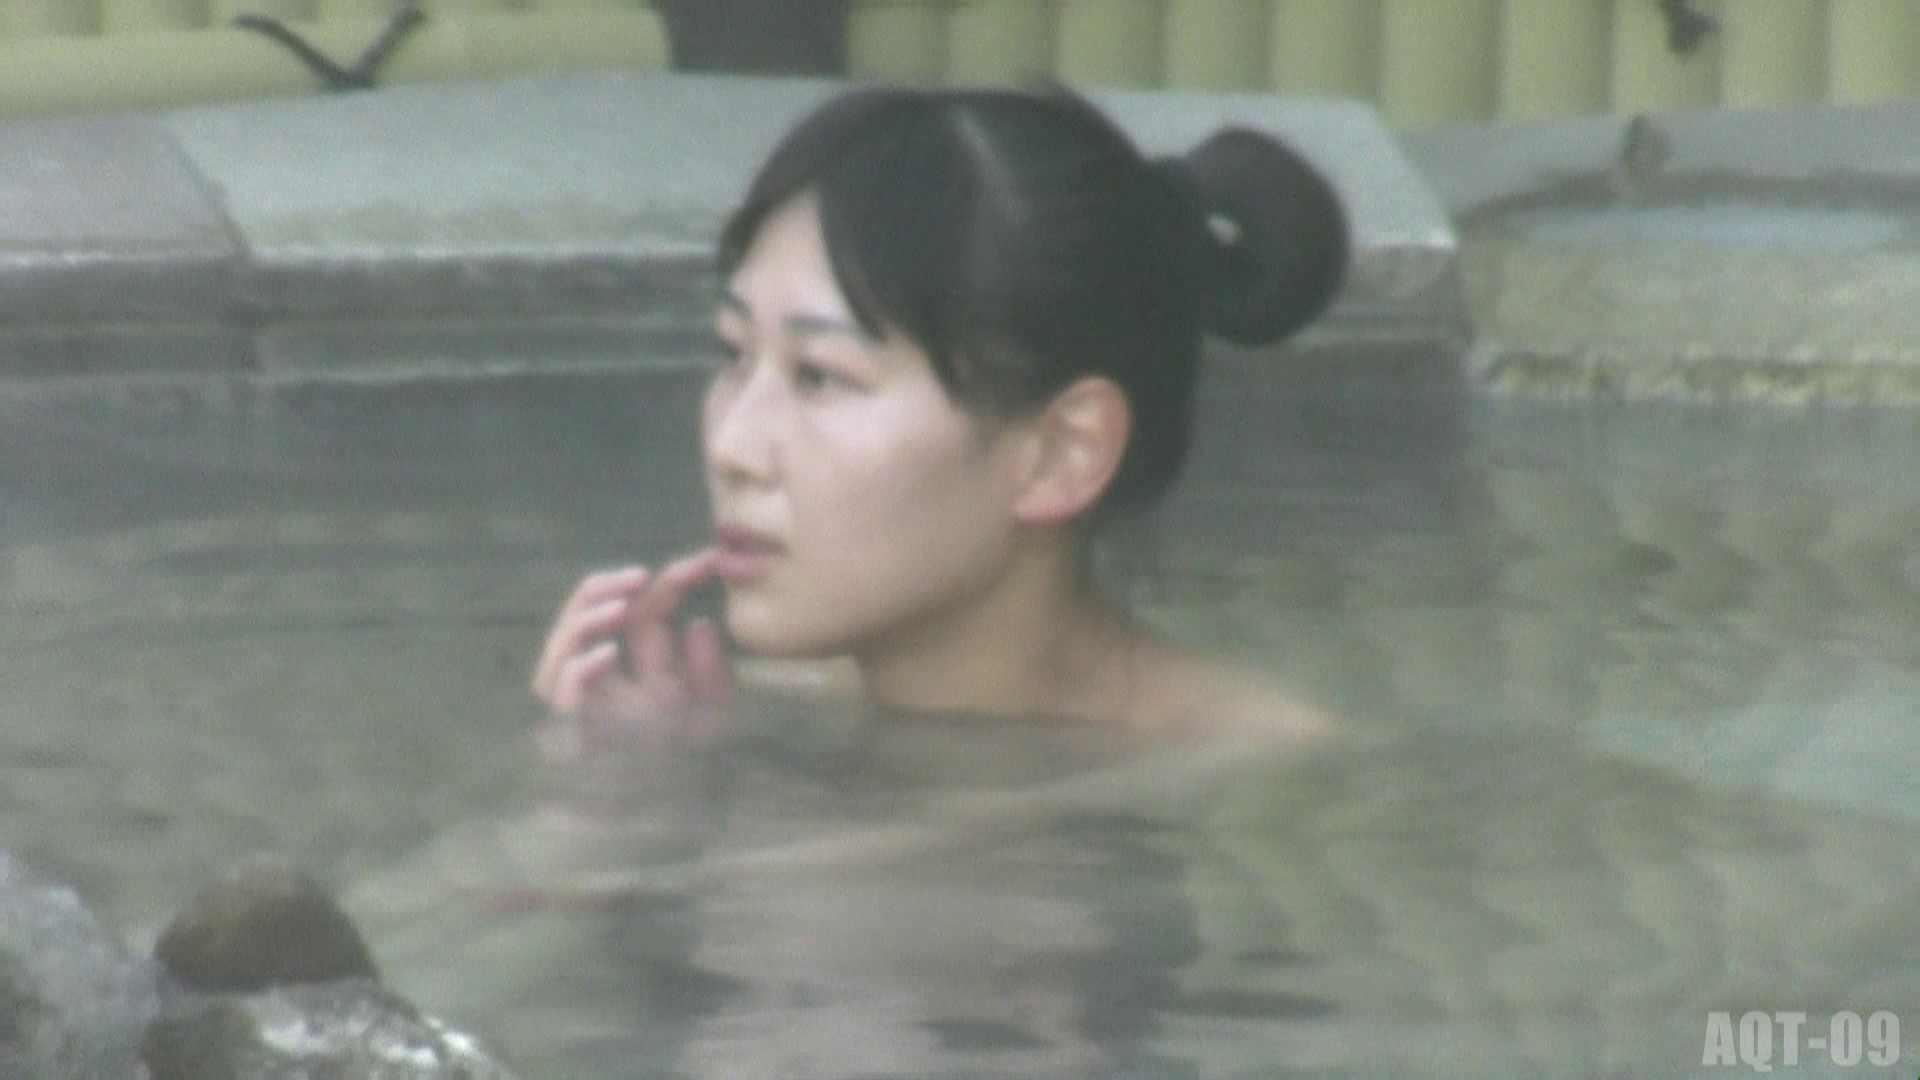 Aquaな露天風呂Vol.785 露天風呂編  110PIX 30